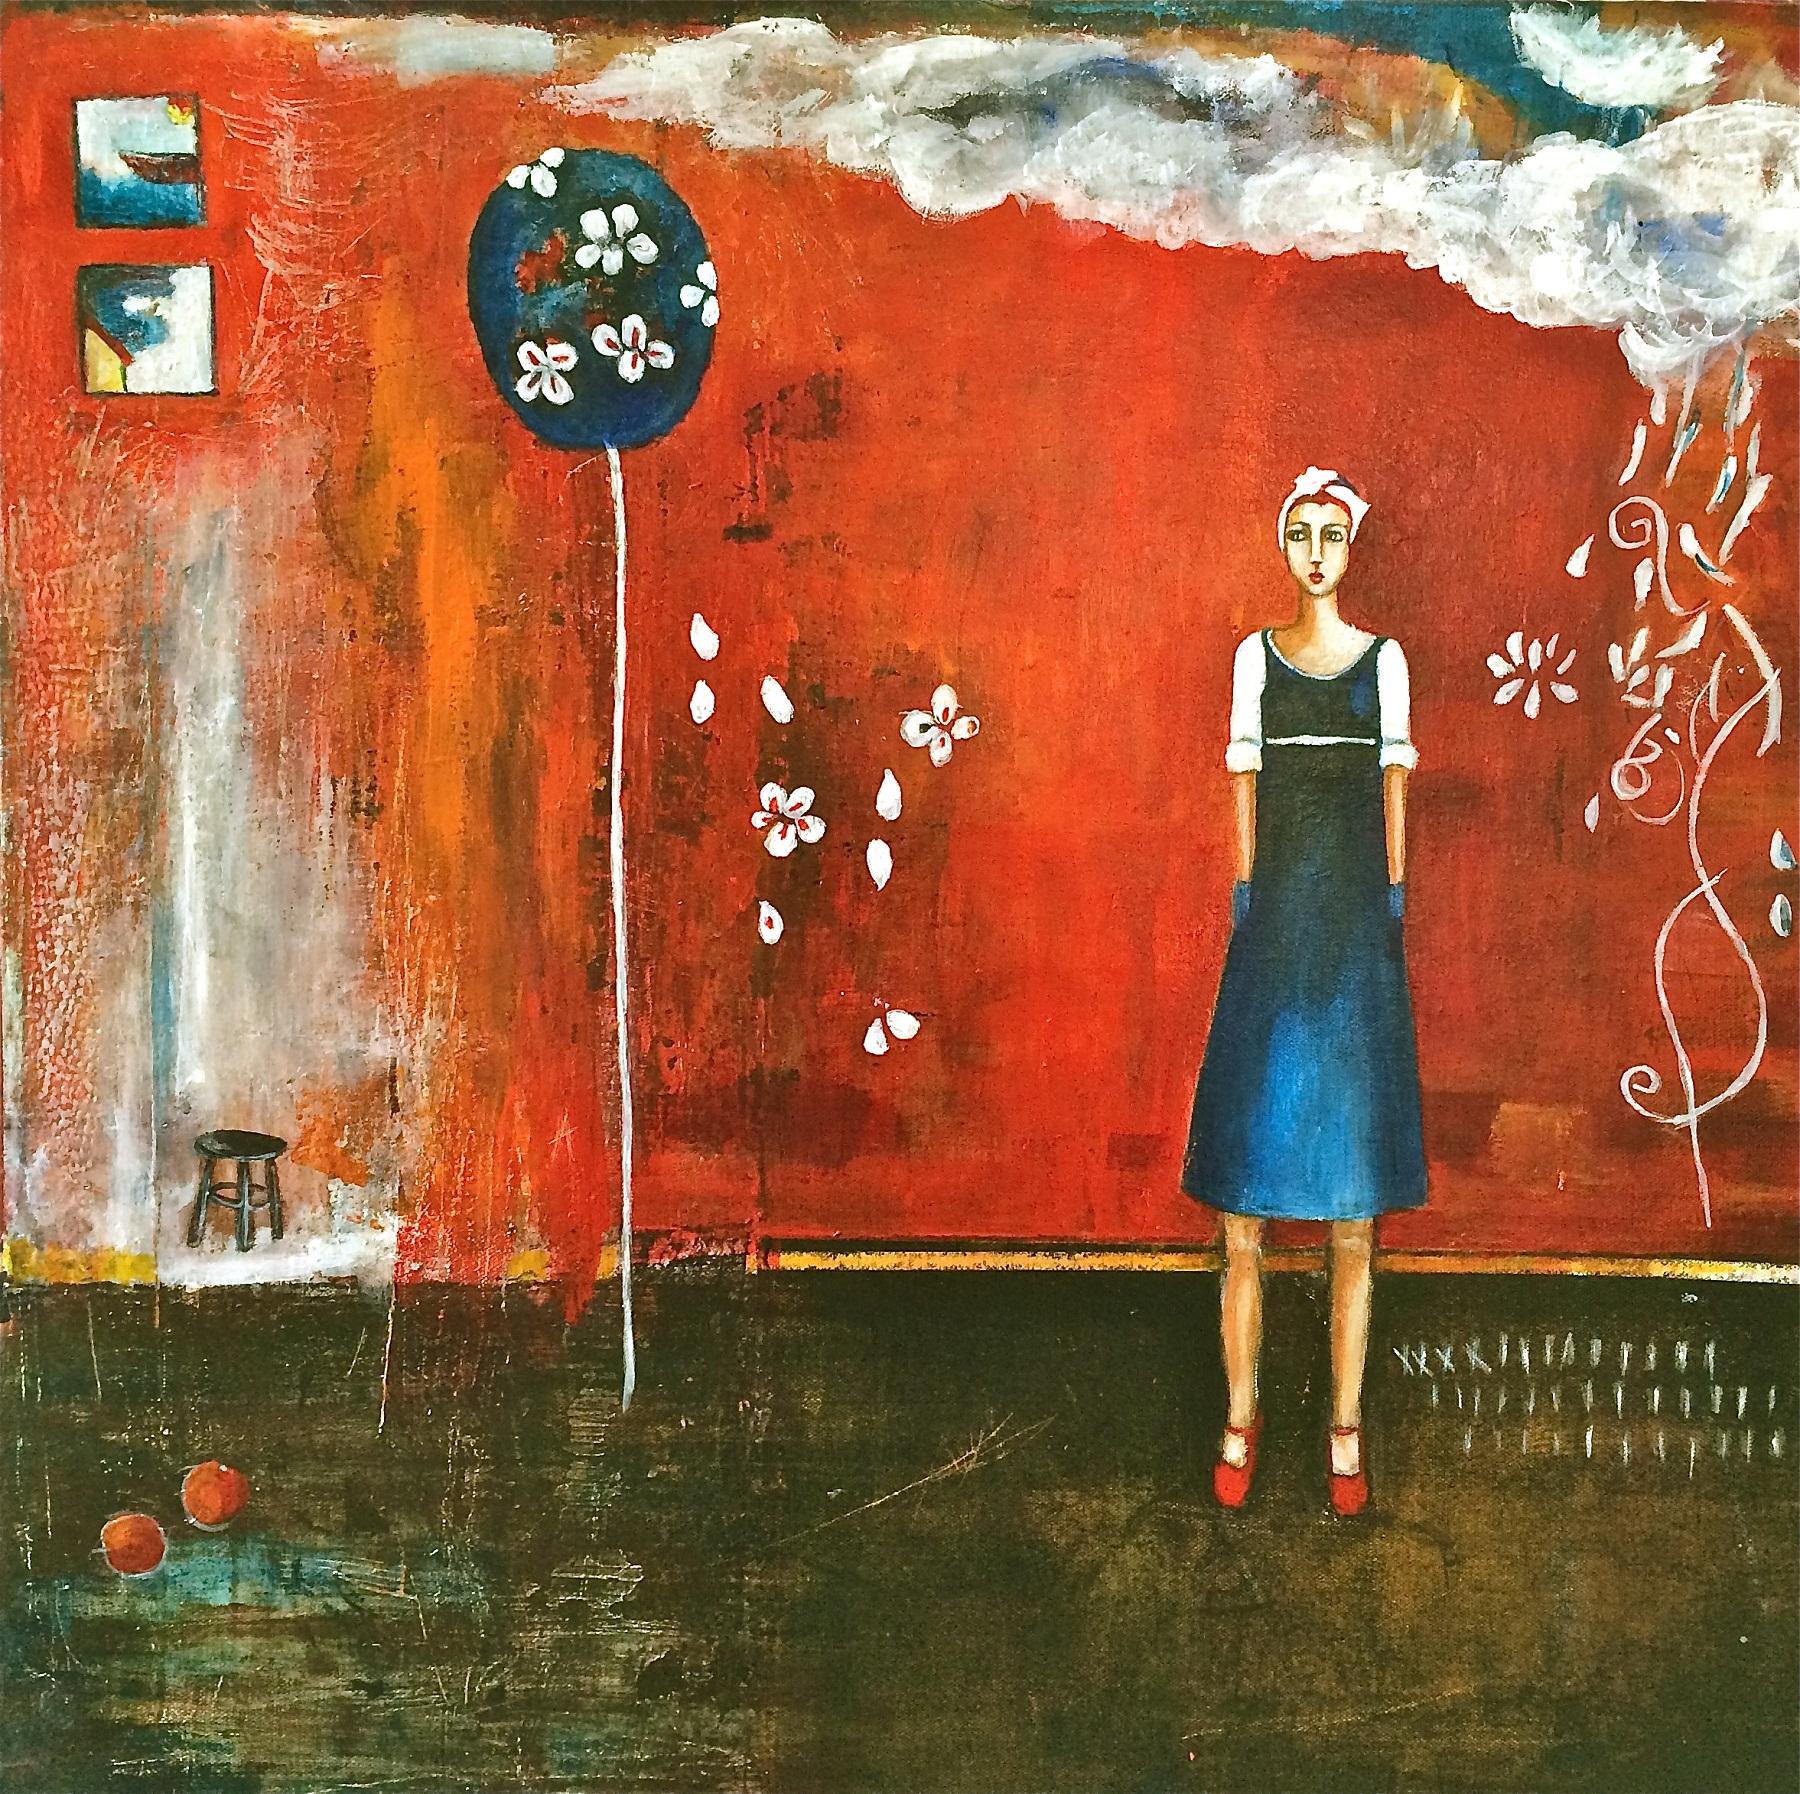 SCHOOL SHOES by Mrs. ANA MARINI - GENZON - Masterpiece Online